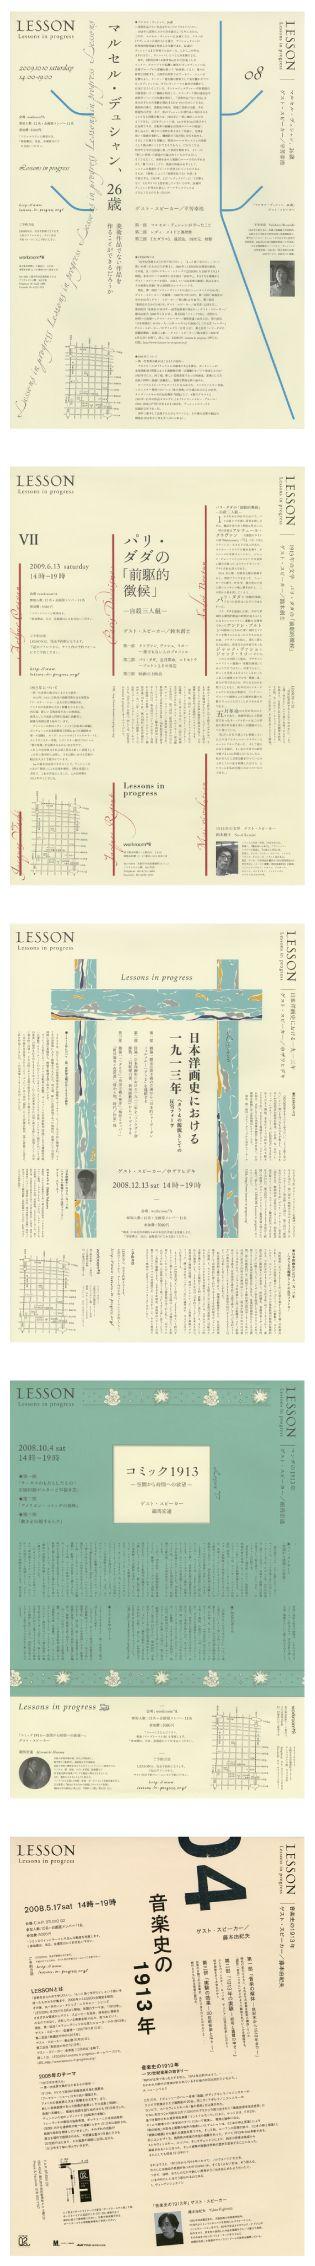 lesson by Atsushi Suzuki (鈴木篤)